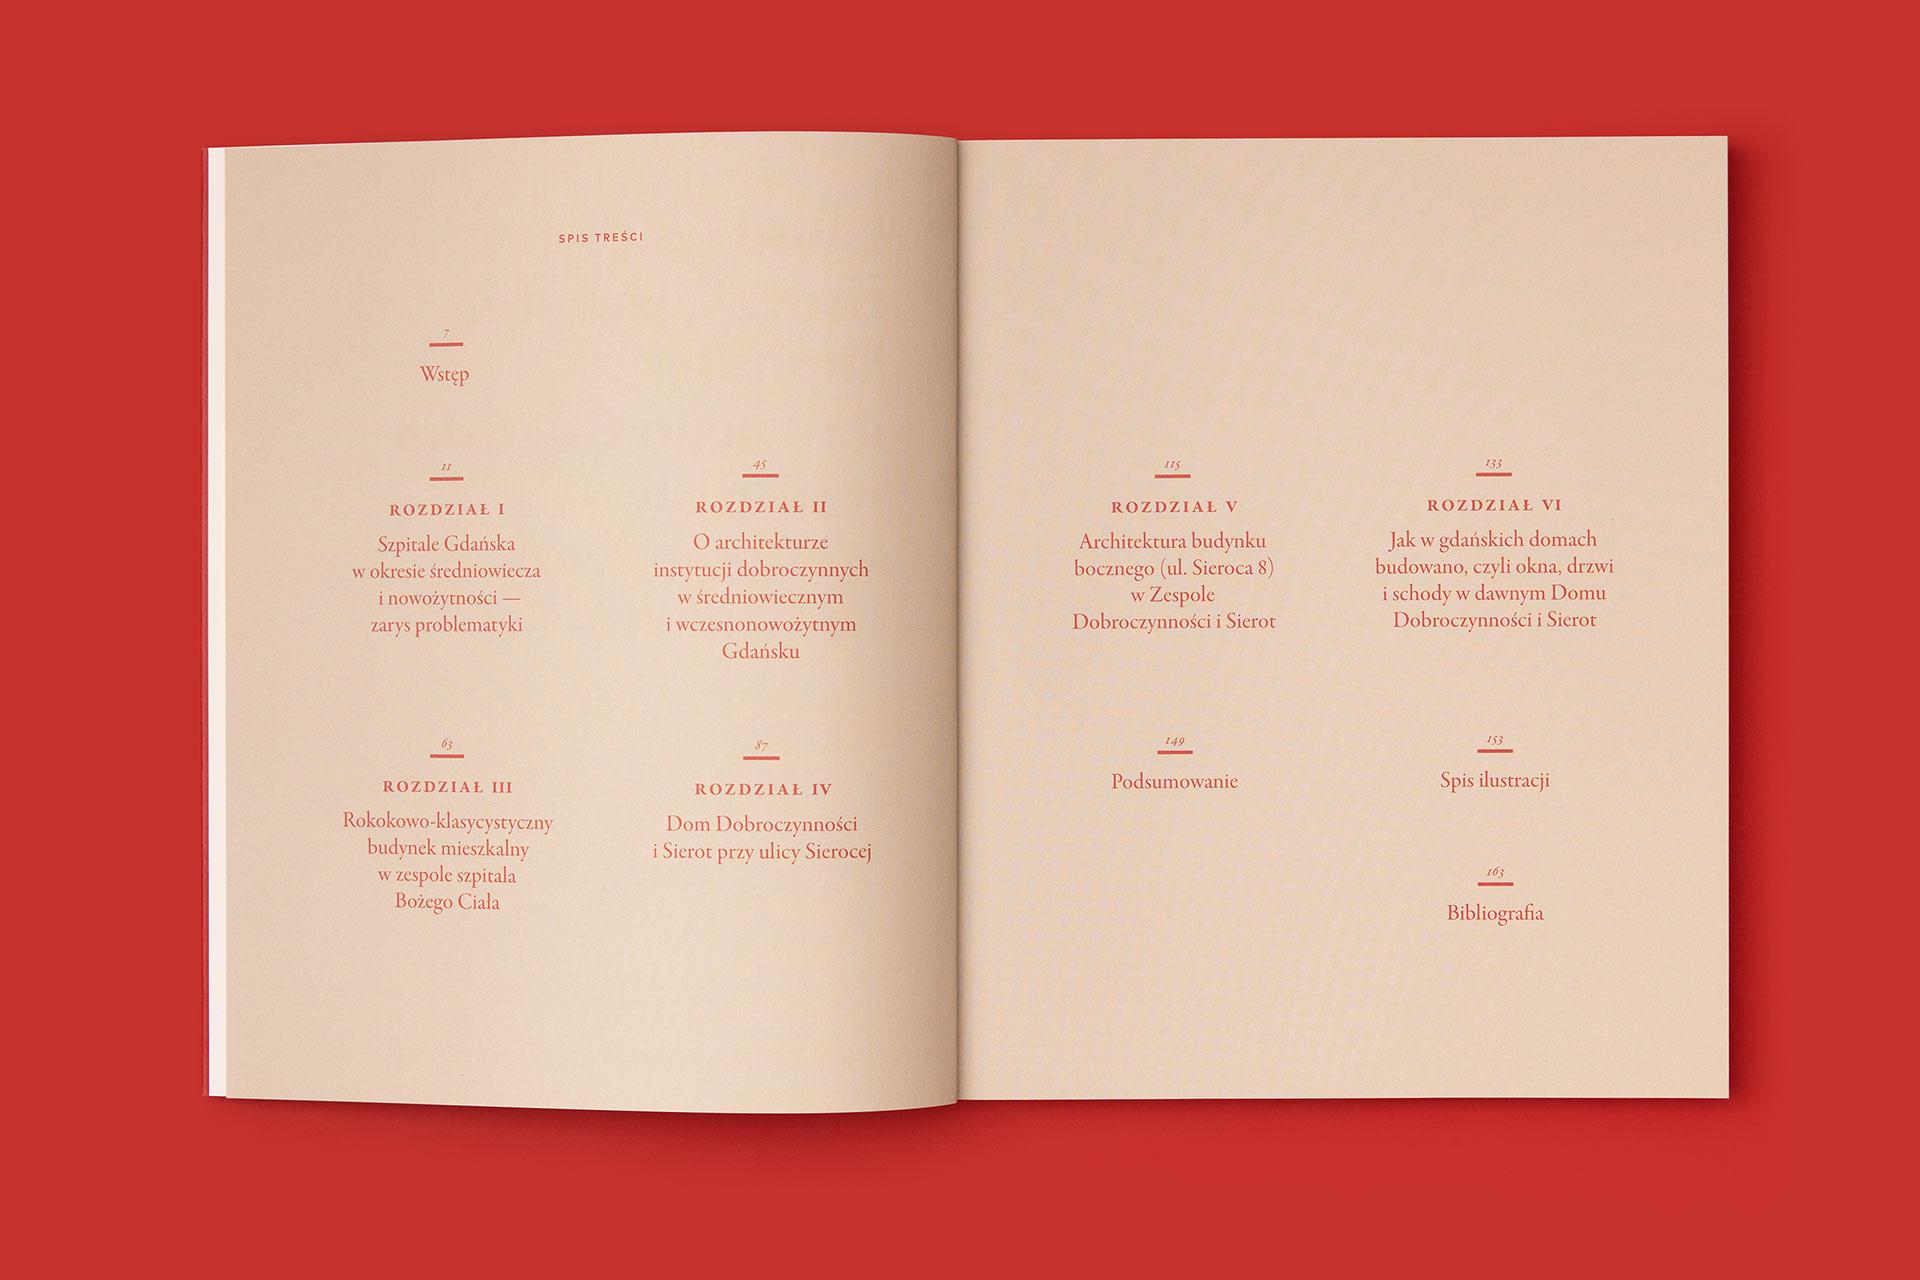 redesign-studio-hospitals-book-reramble3